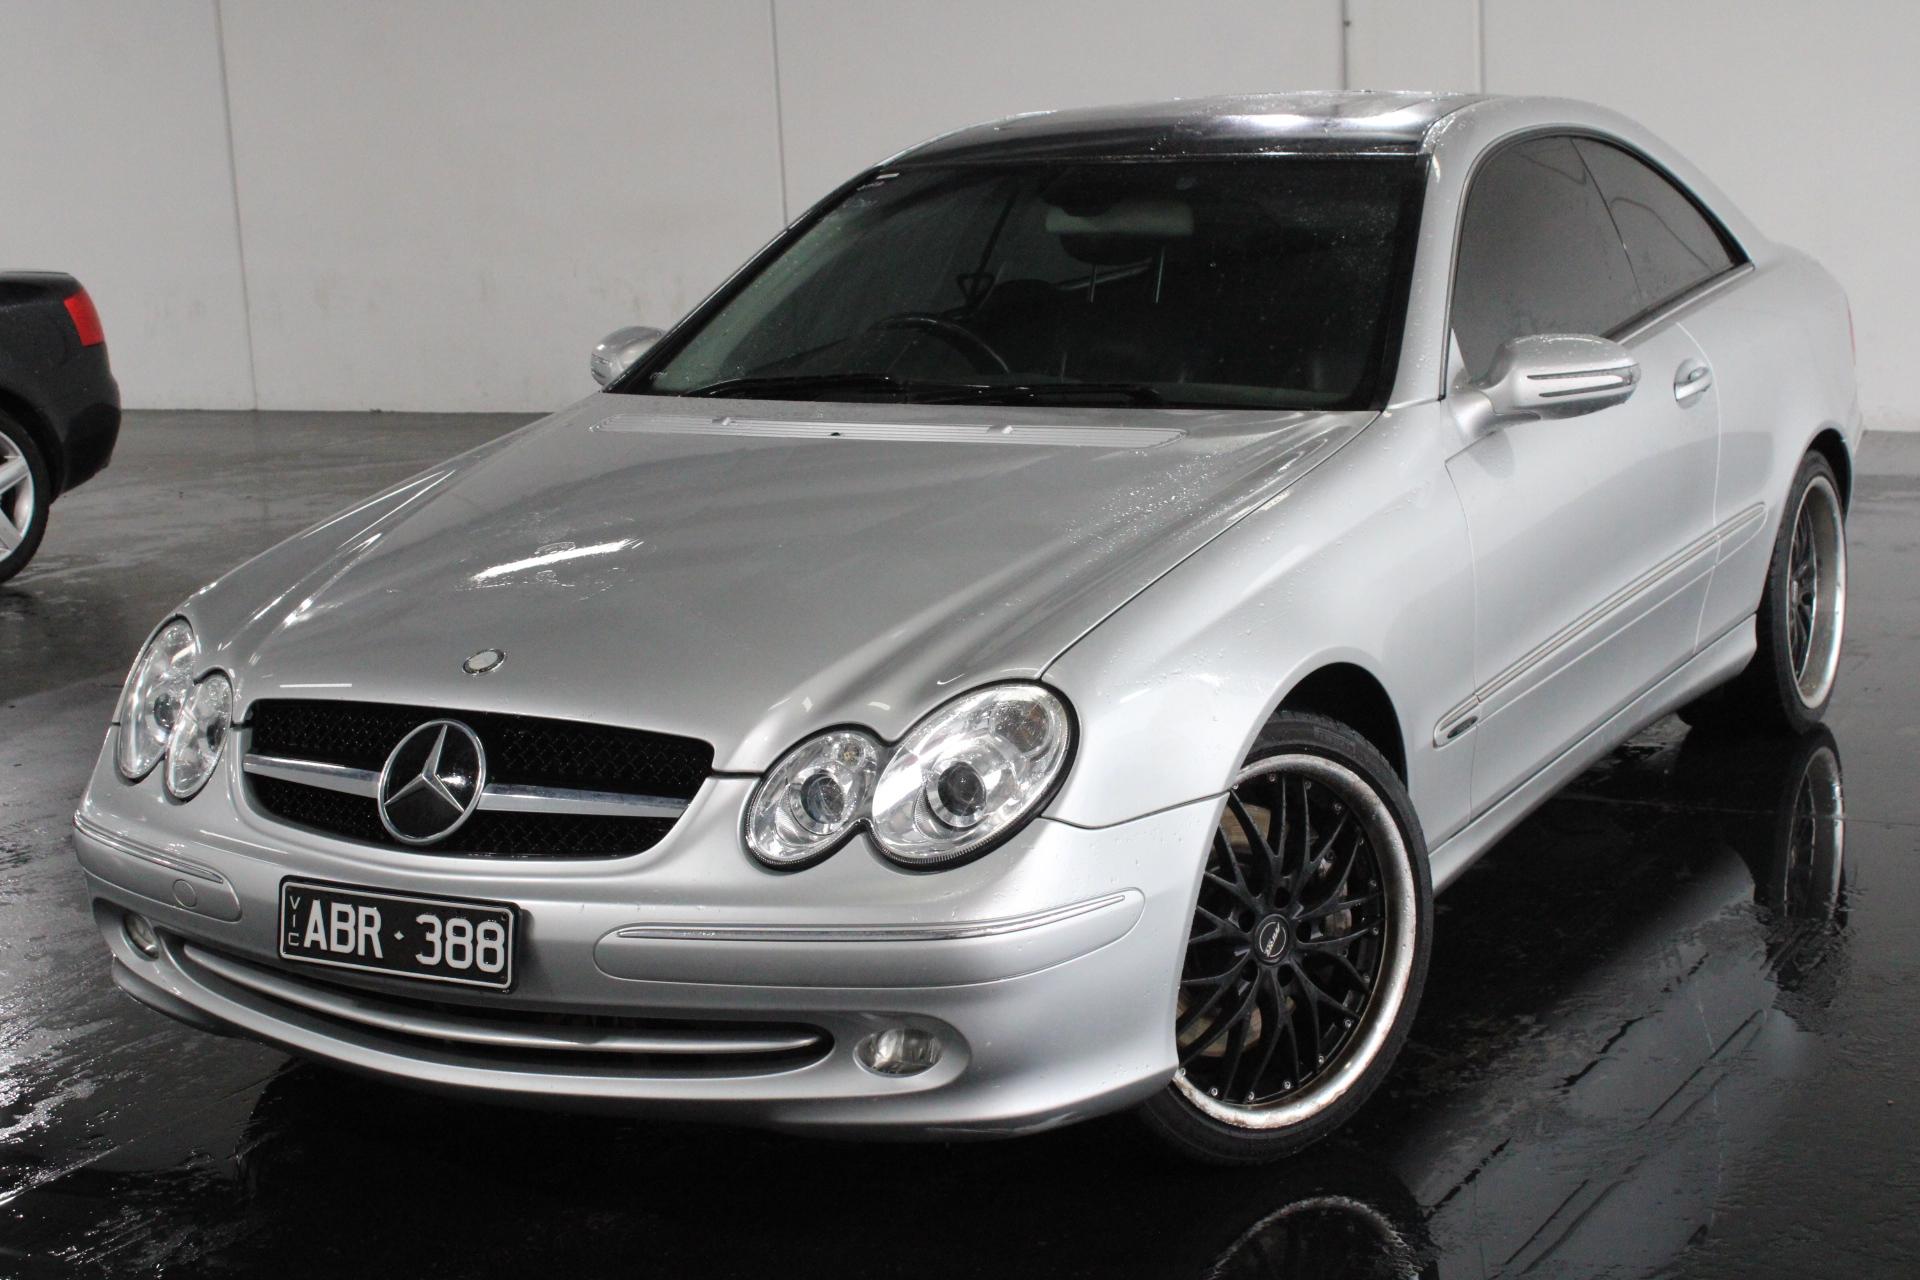 2003 Mercedes Benz CLK500 Avantgarde C209 V8 Automatic Coupe